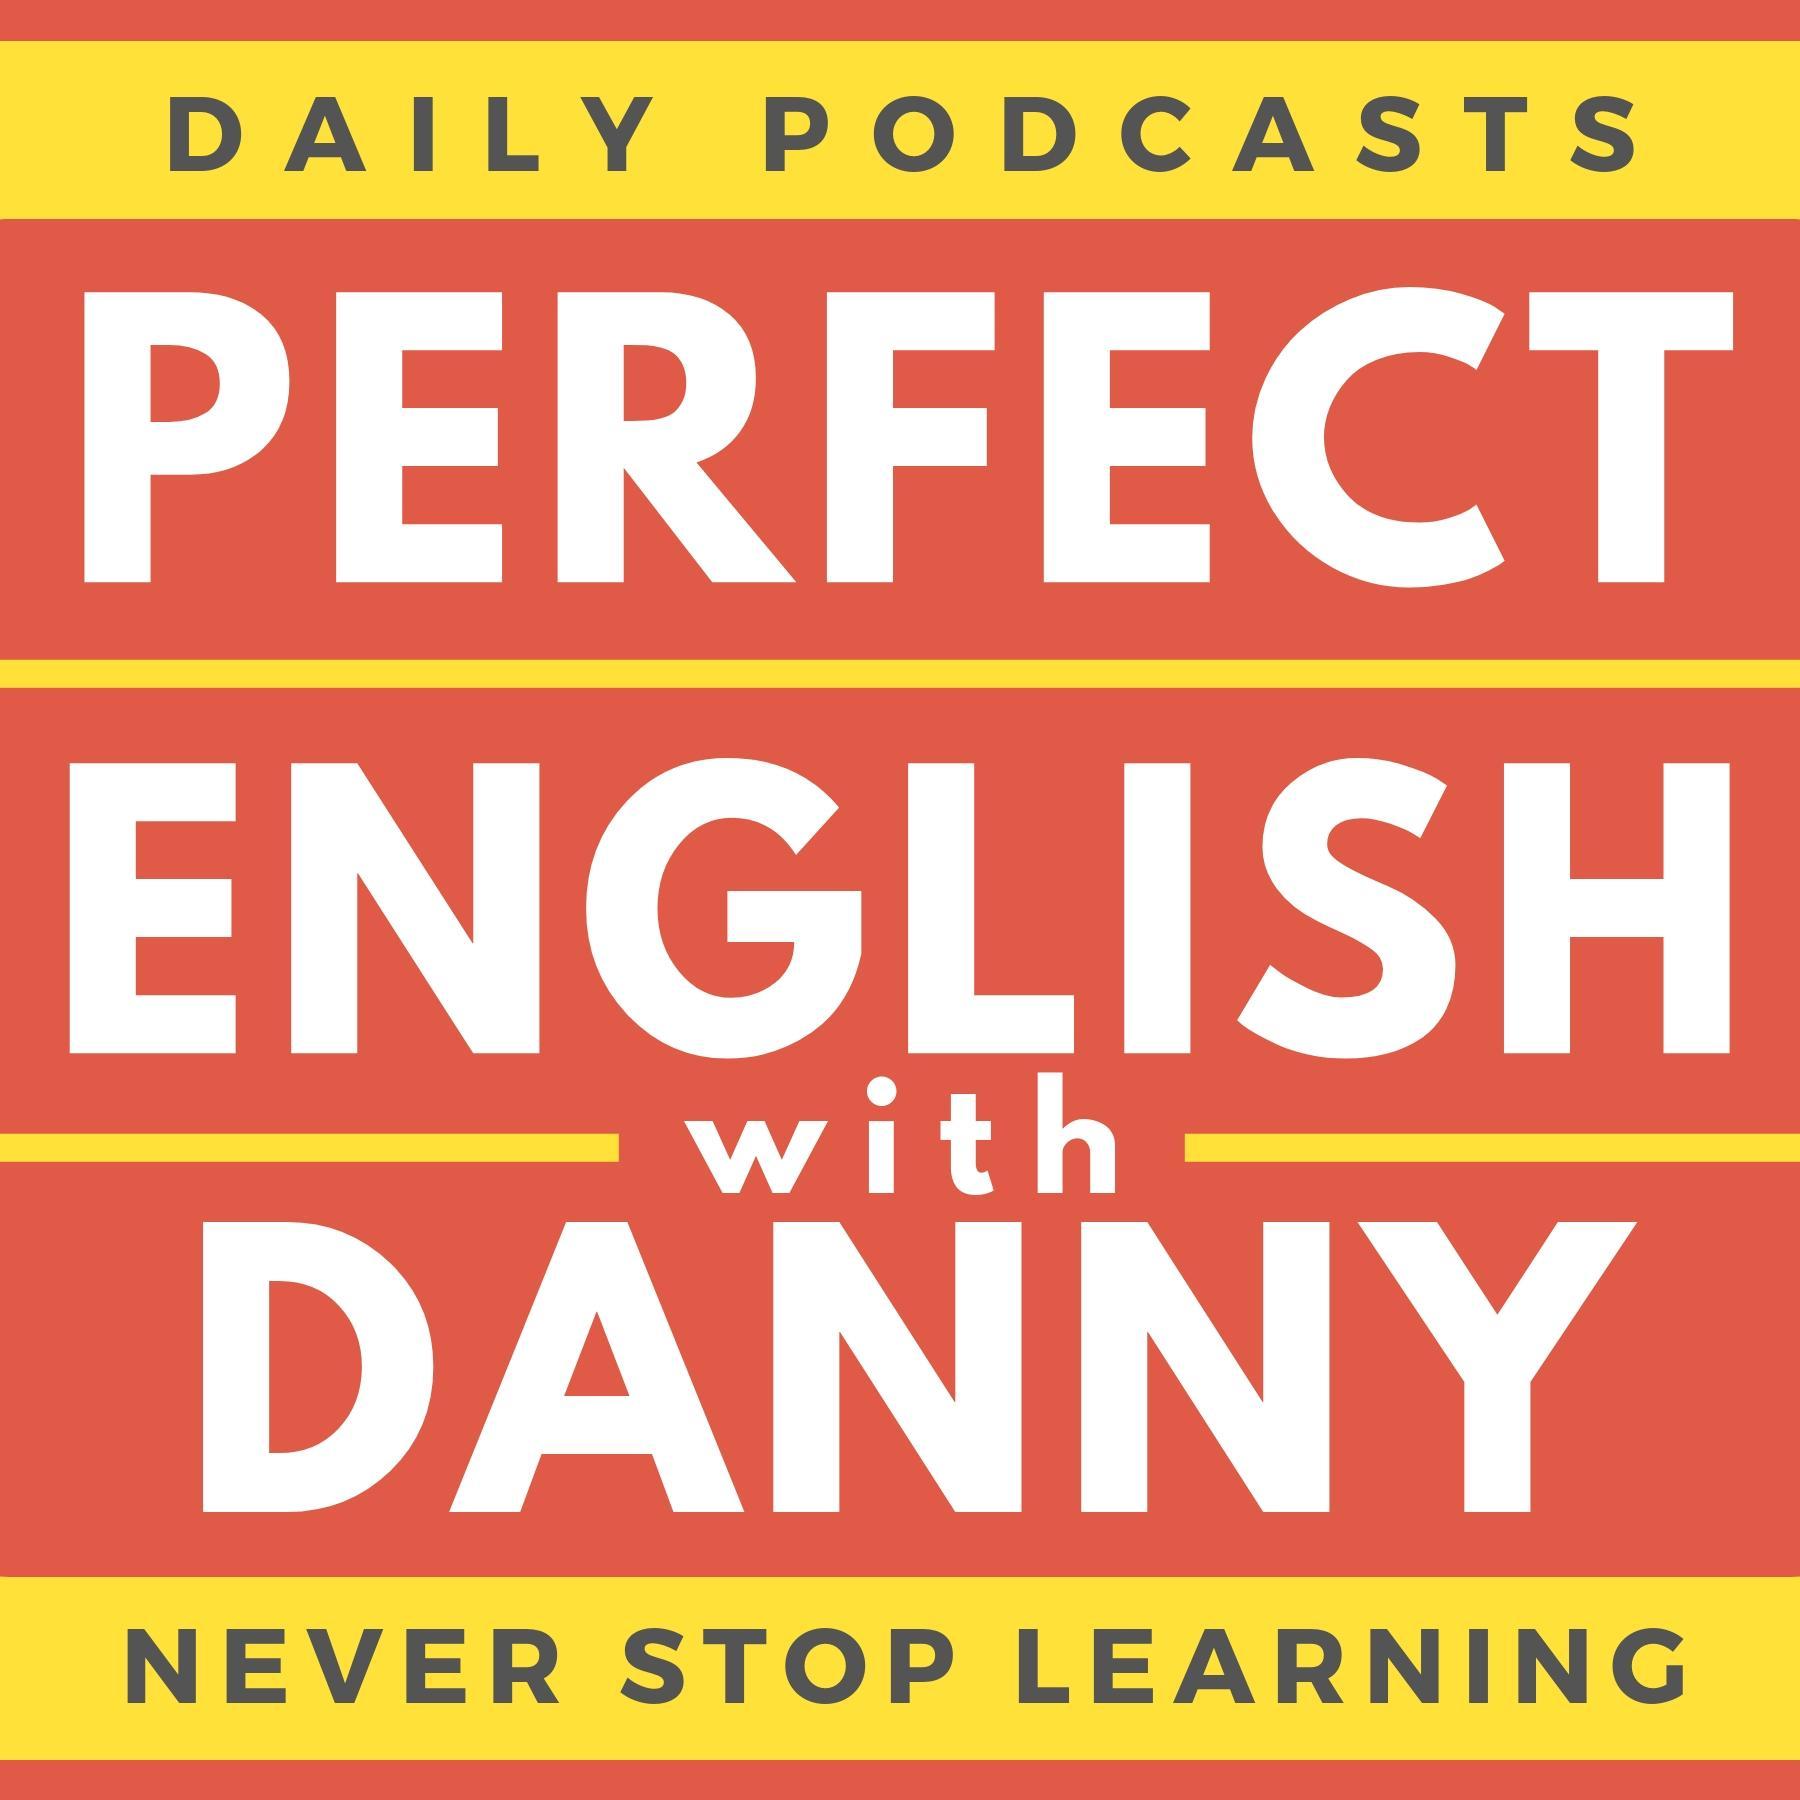 Episode 133 - Vocabulary Builder - Describign Personality 1-3